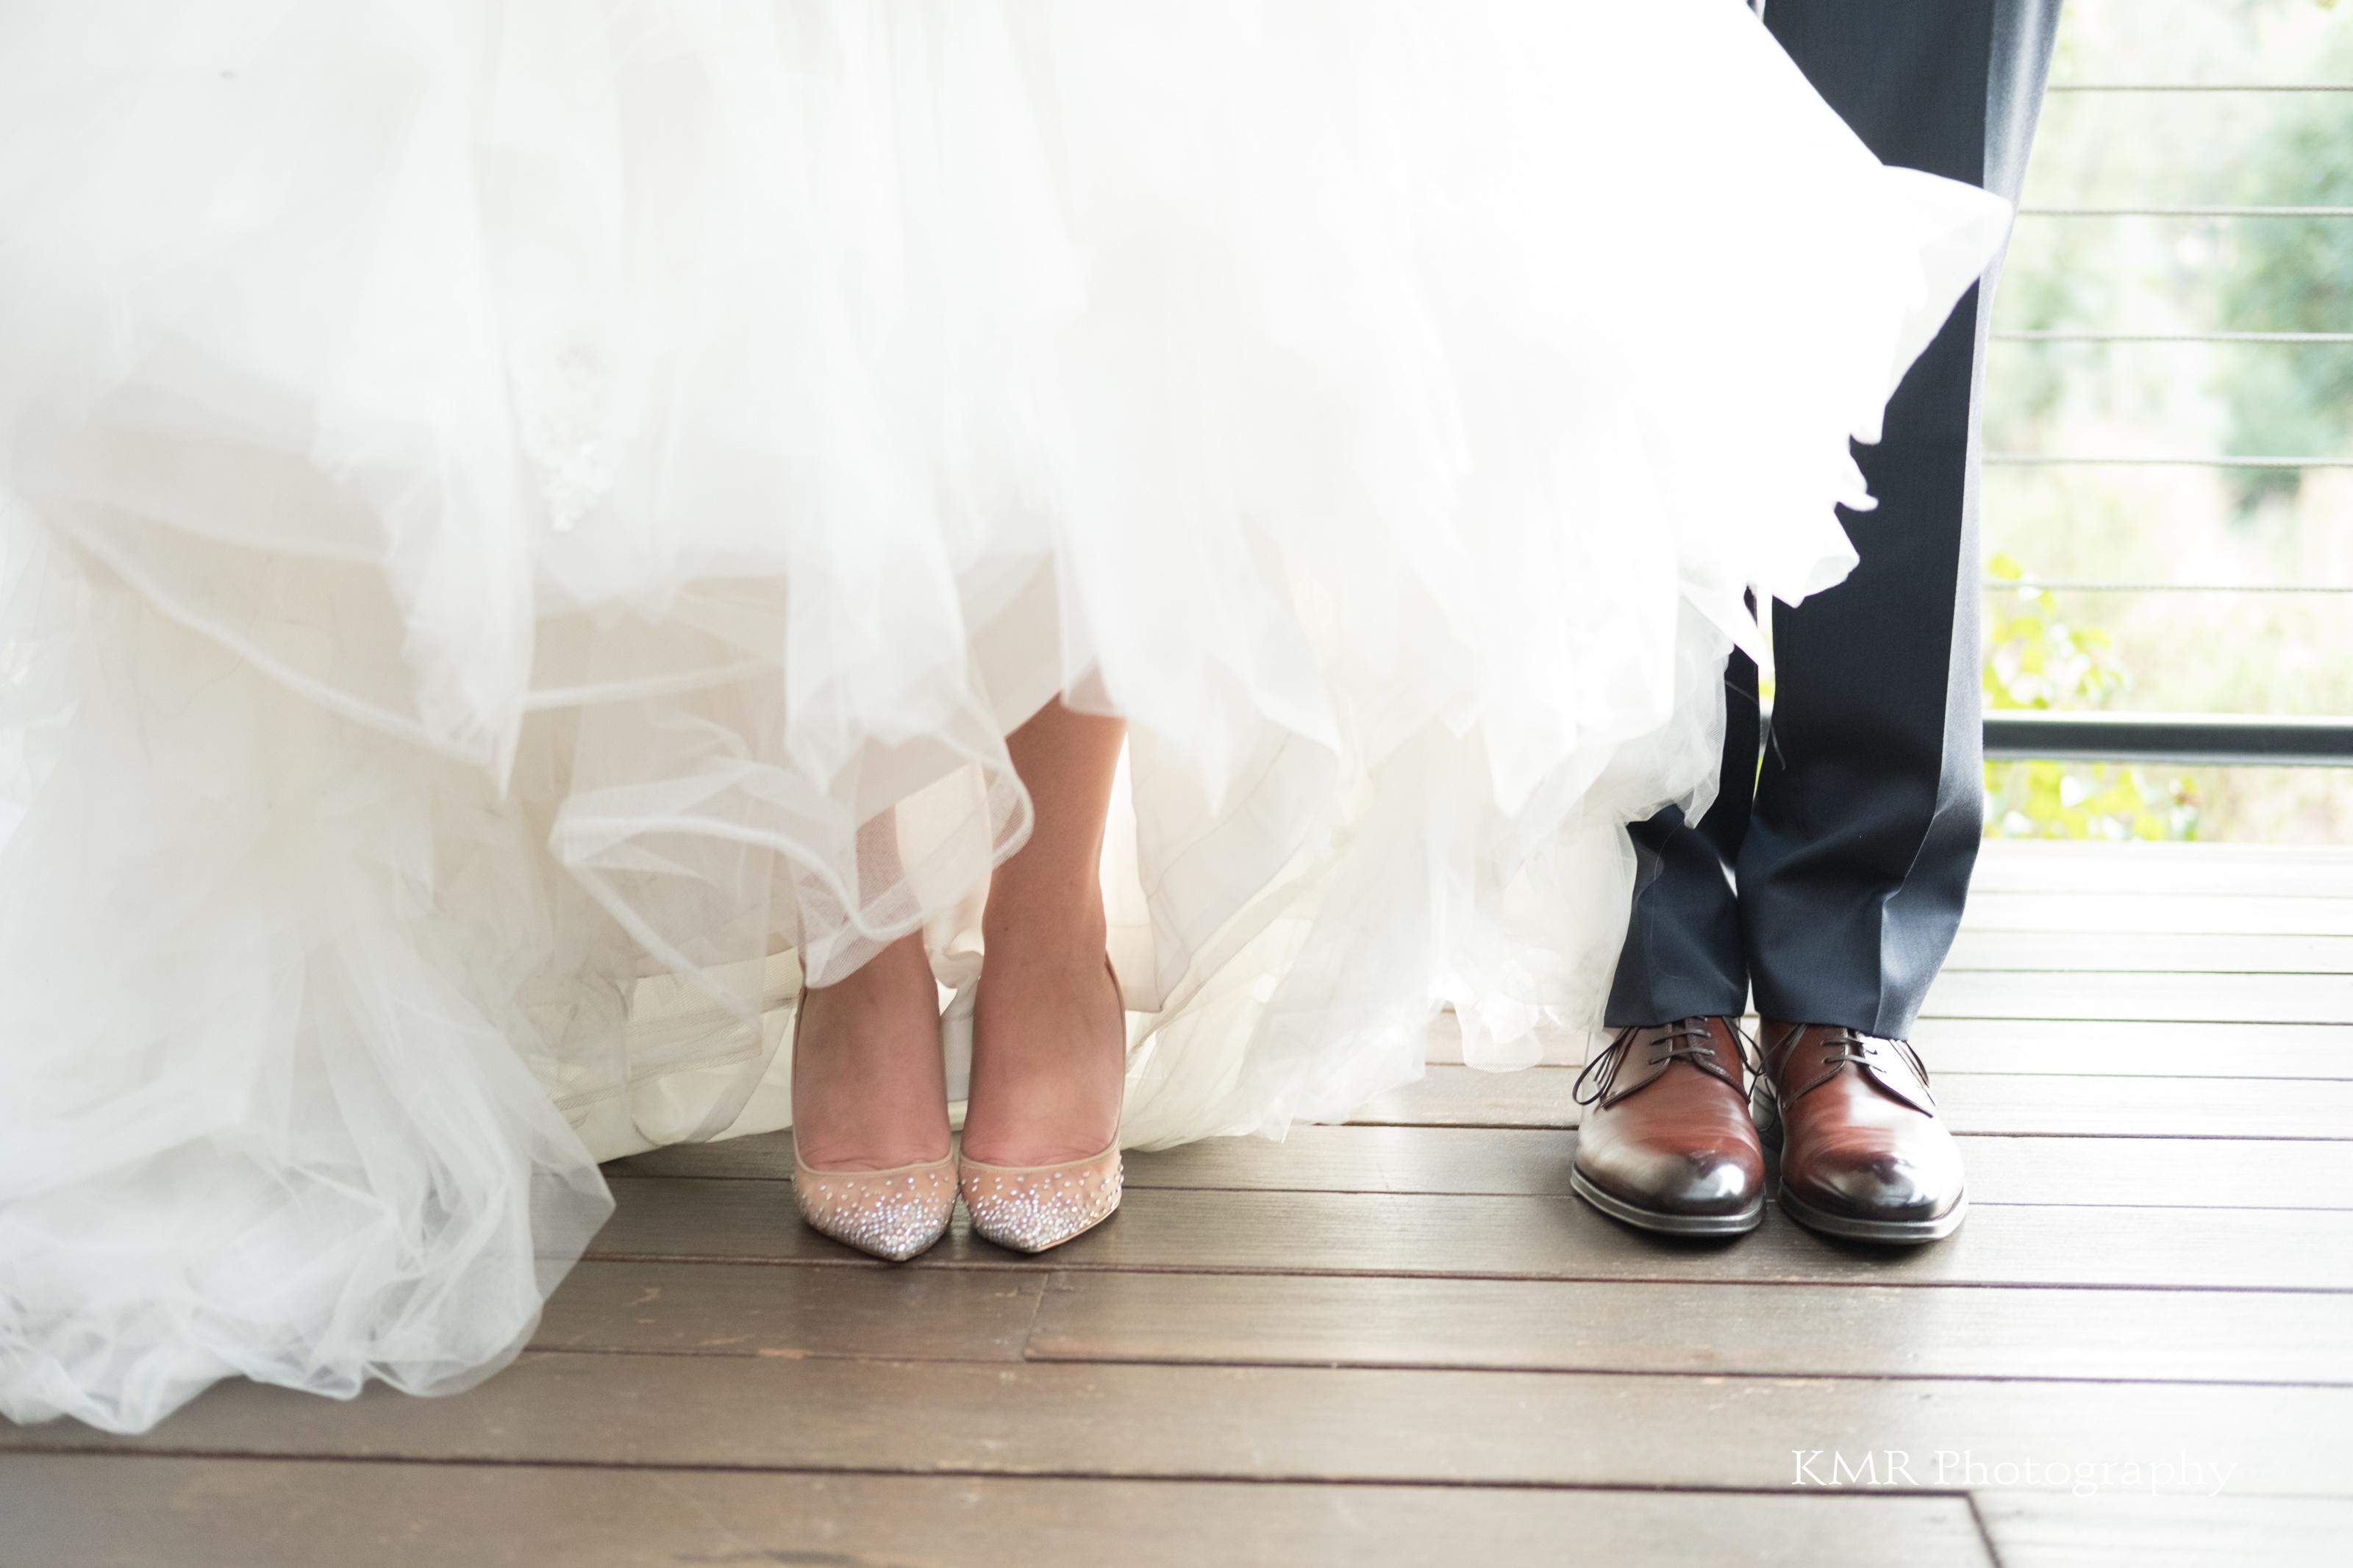 Calistoga Ranch wedding couple shoes